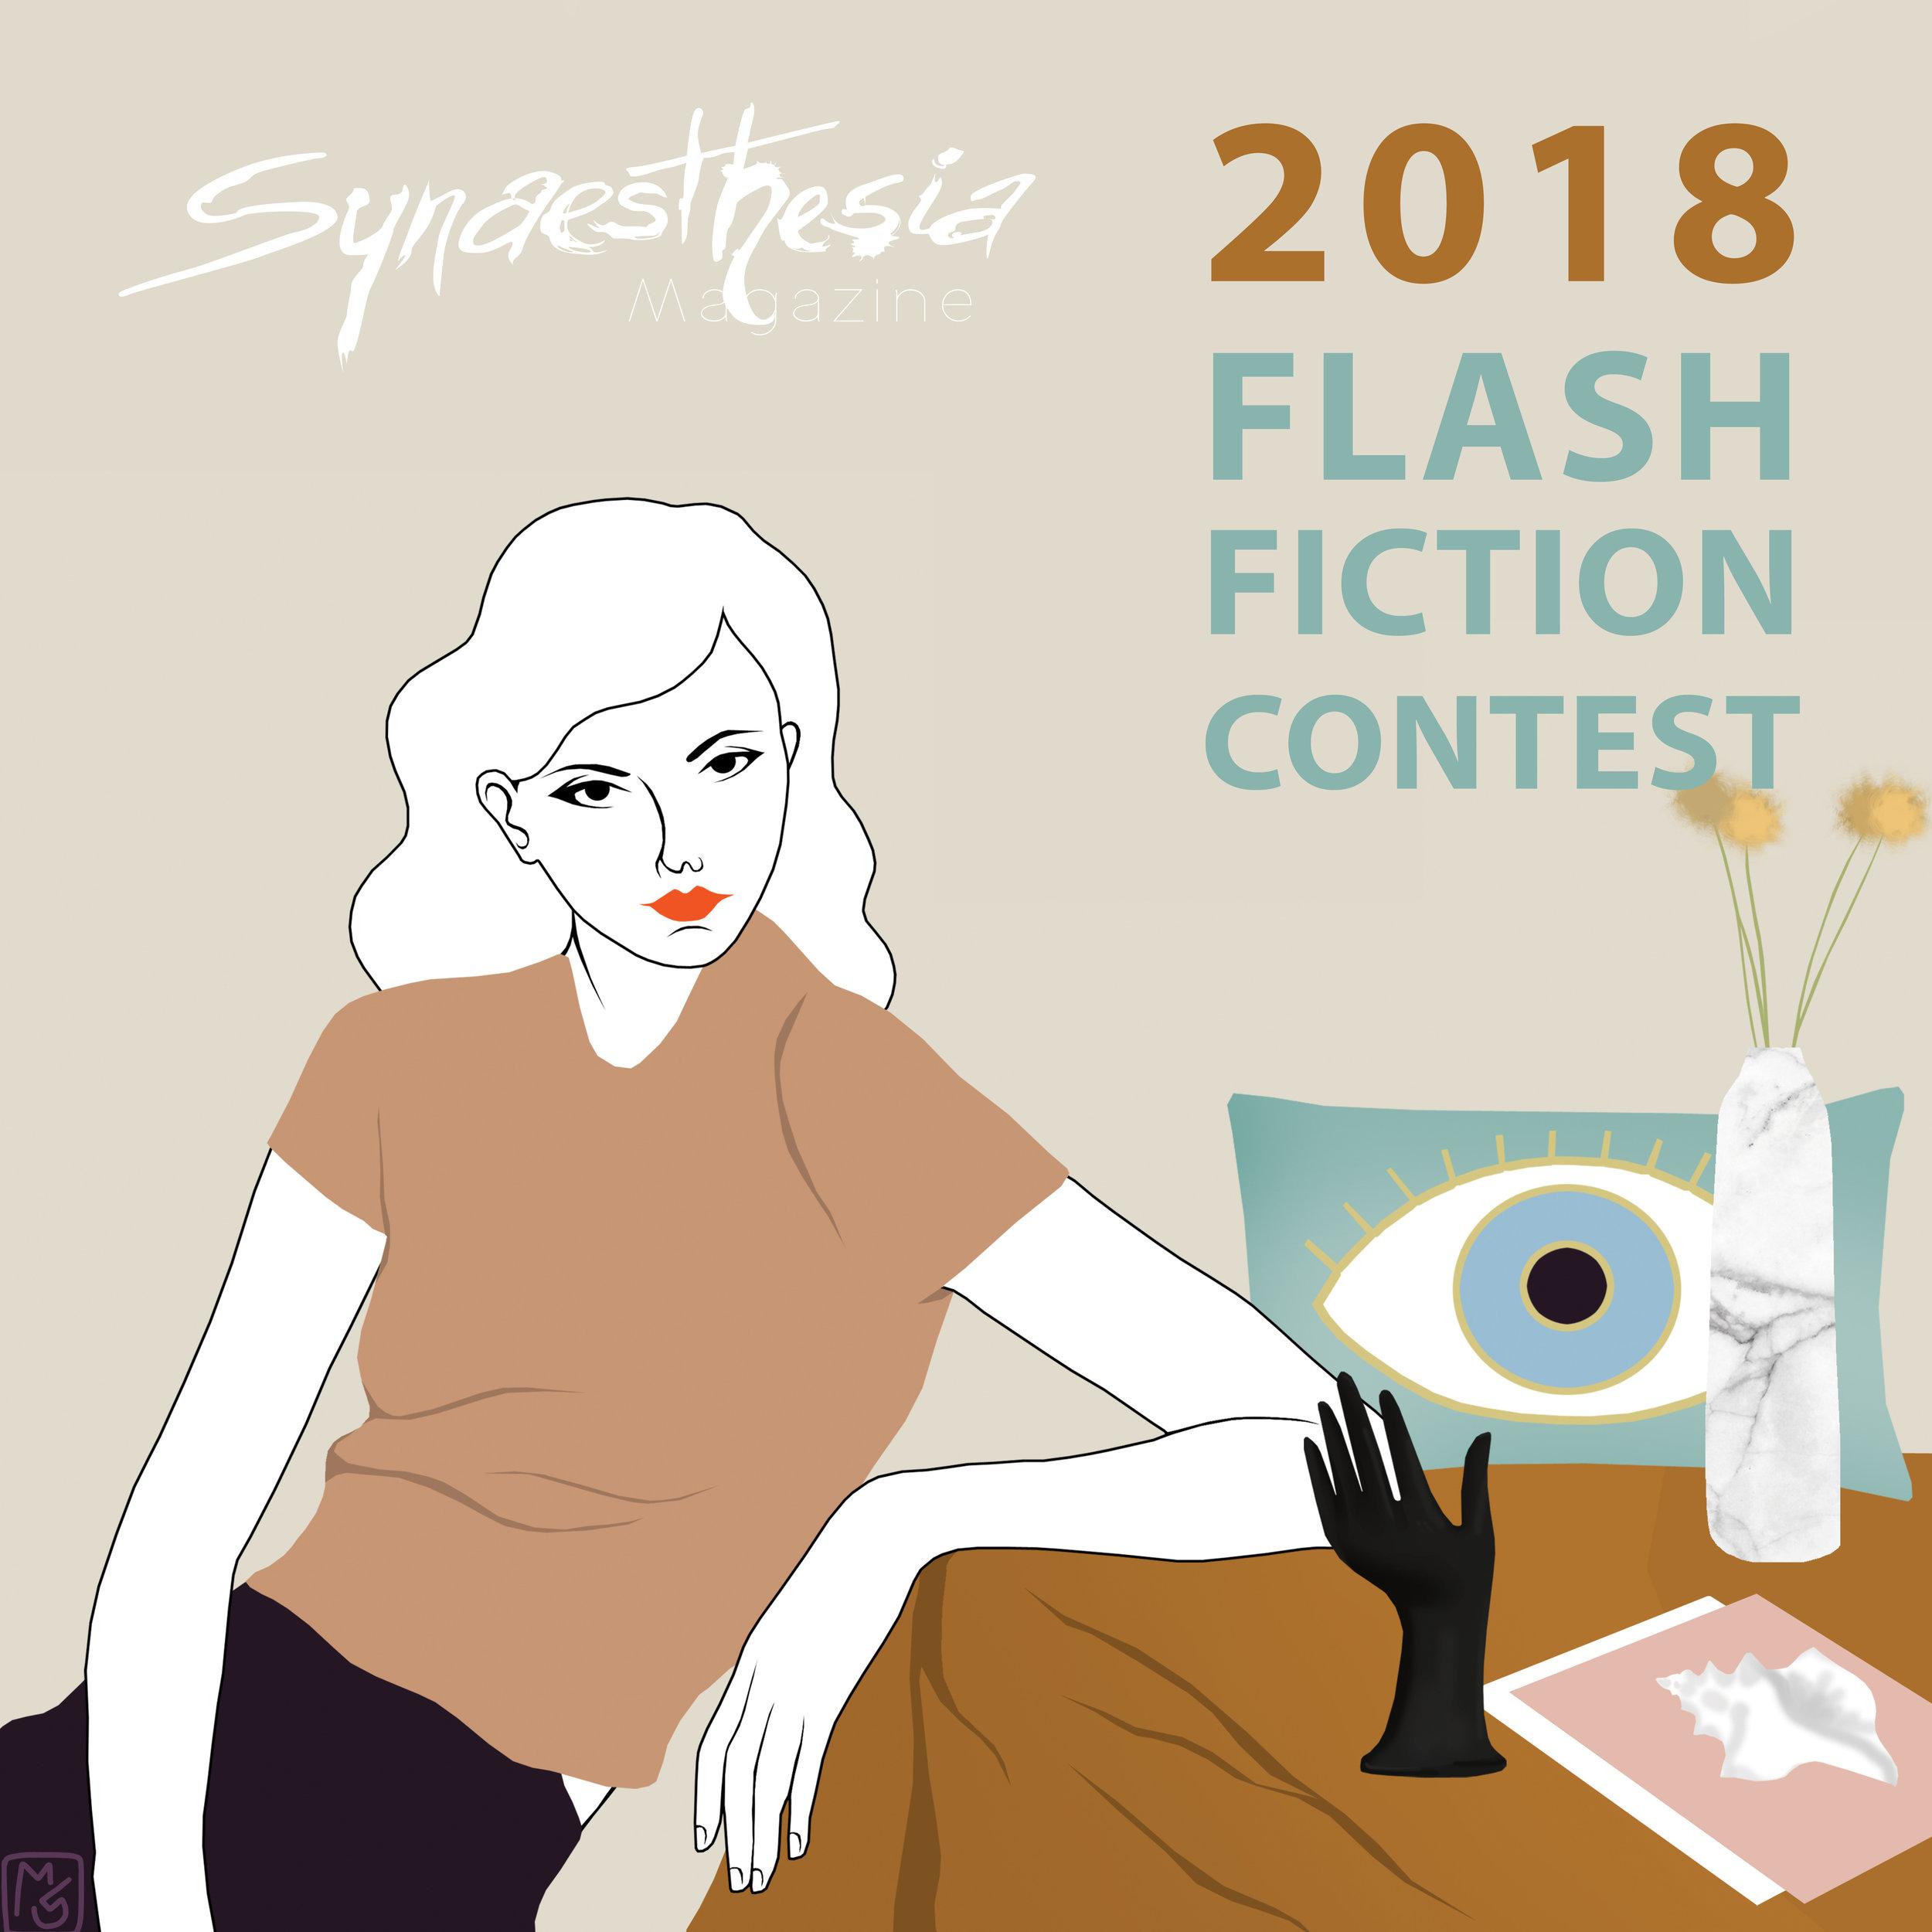 Synaesthesia Magazine Flash Fiction Contest